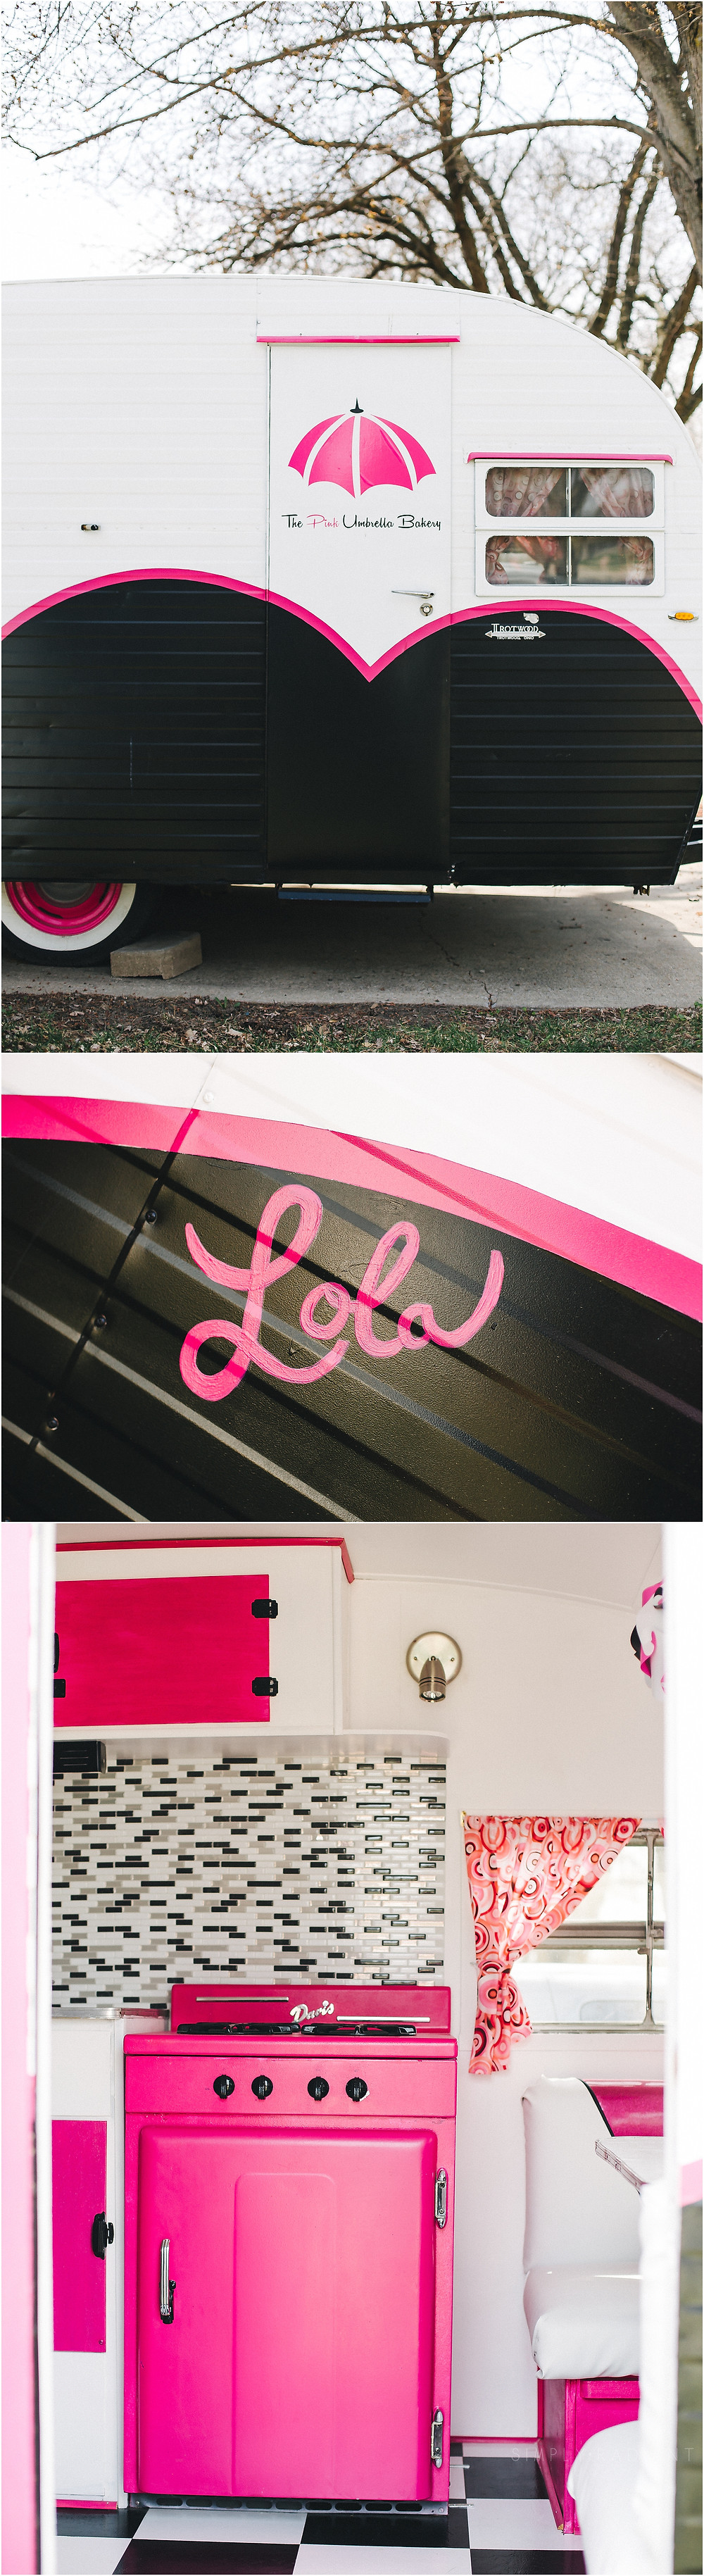 Pink Umbrella Bakery Iowa vintage camper